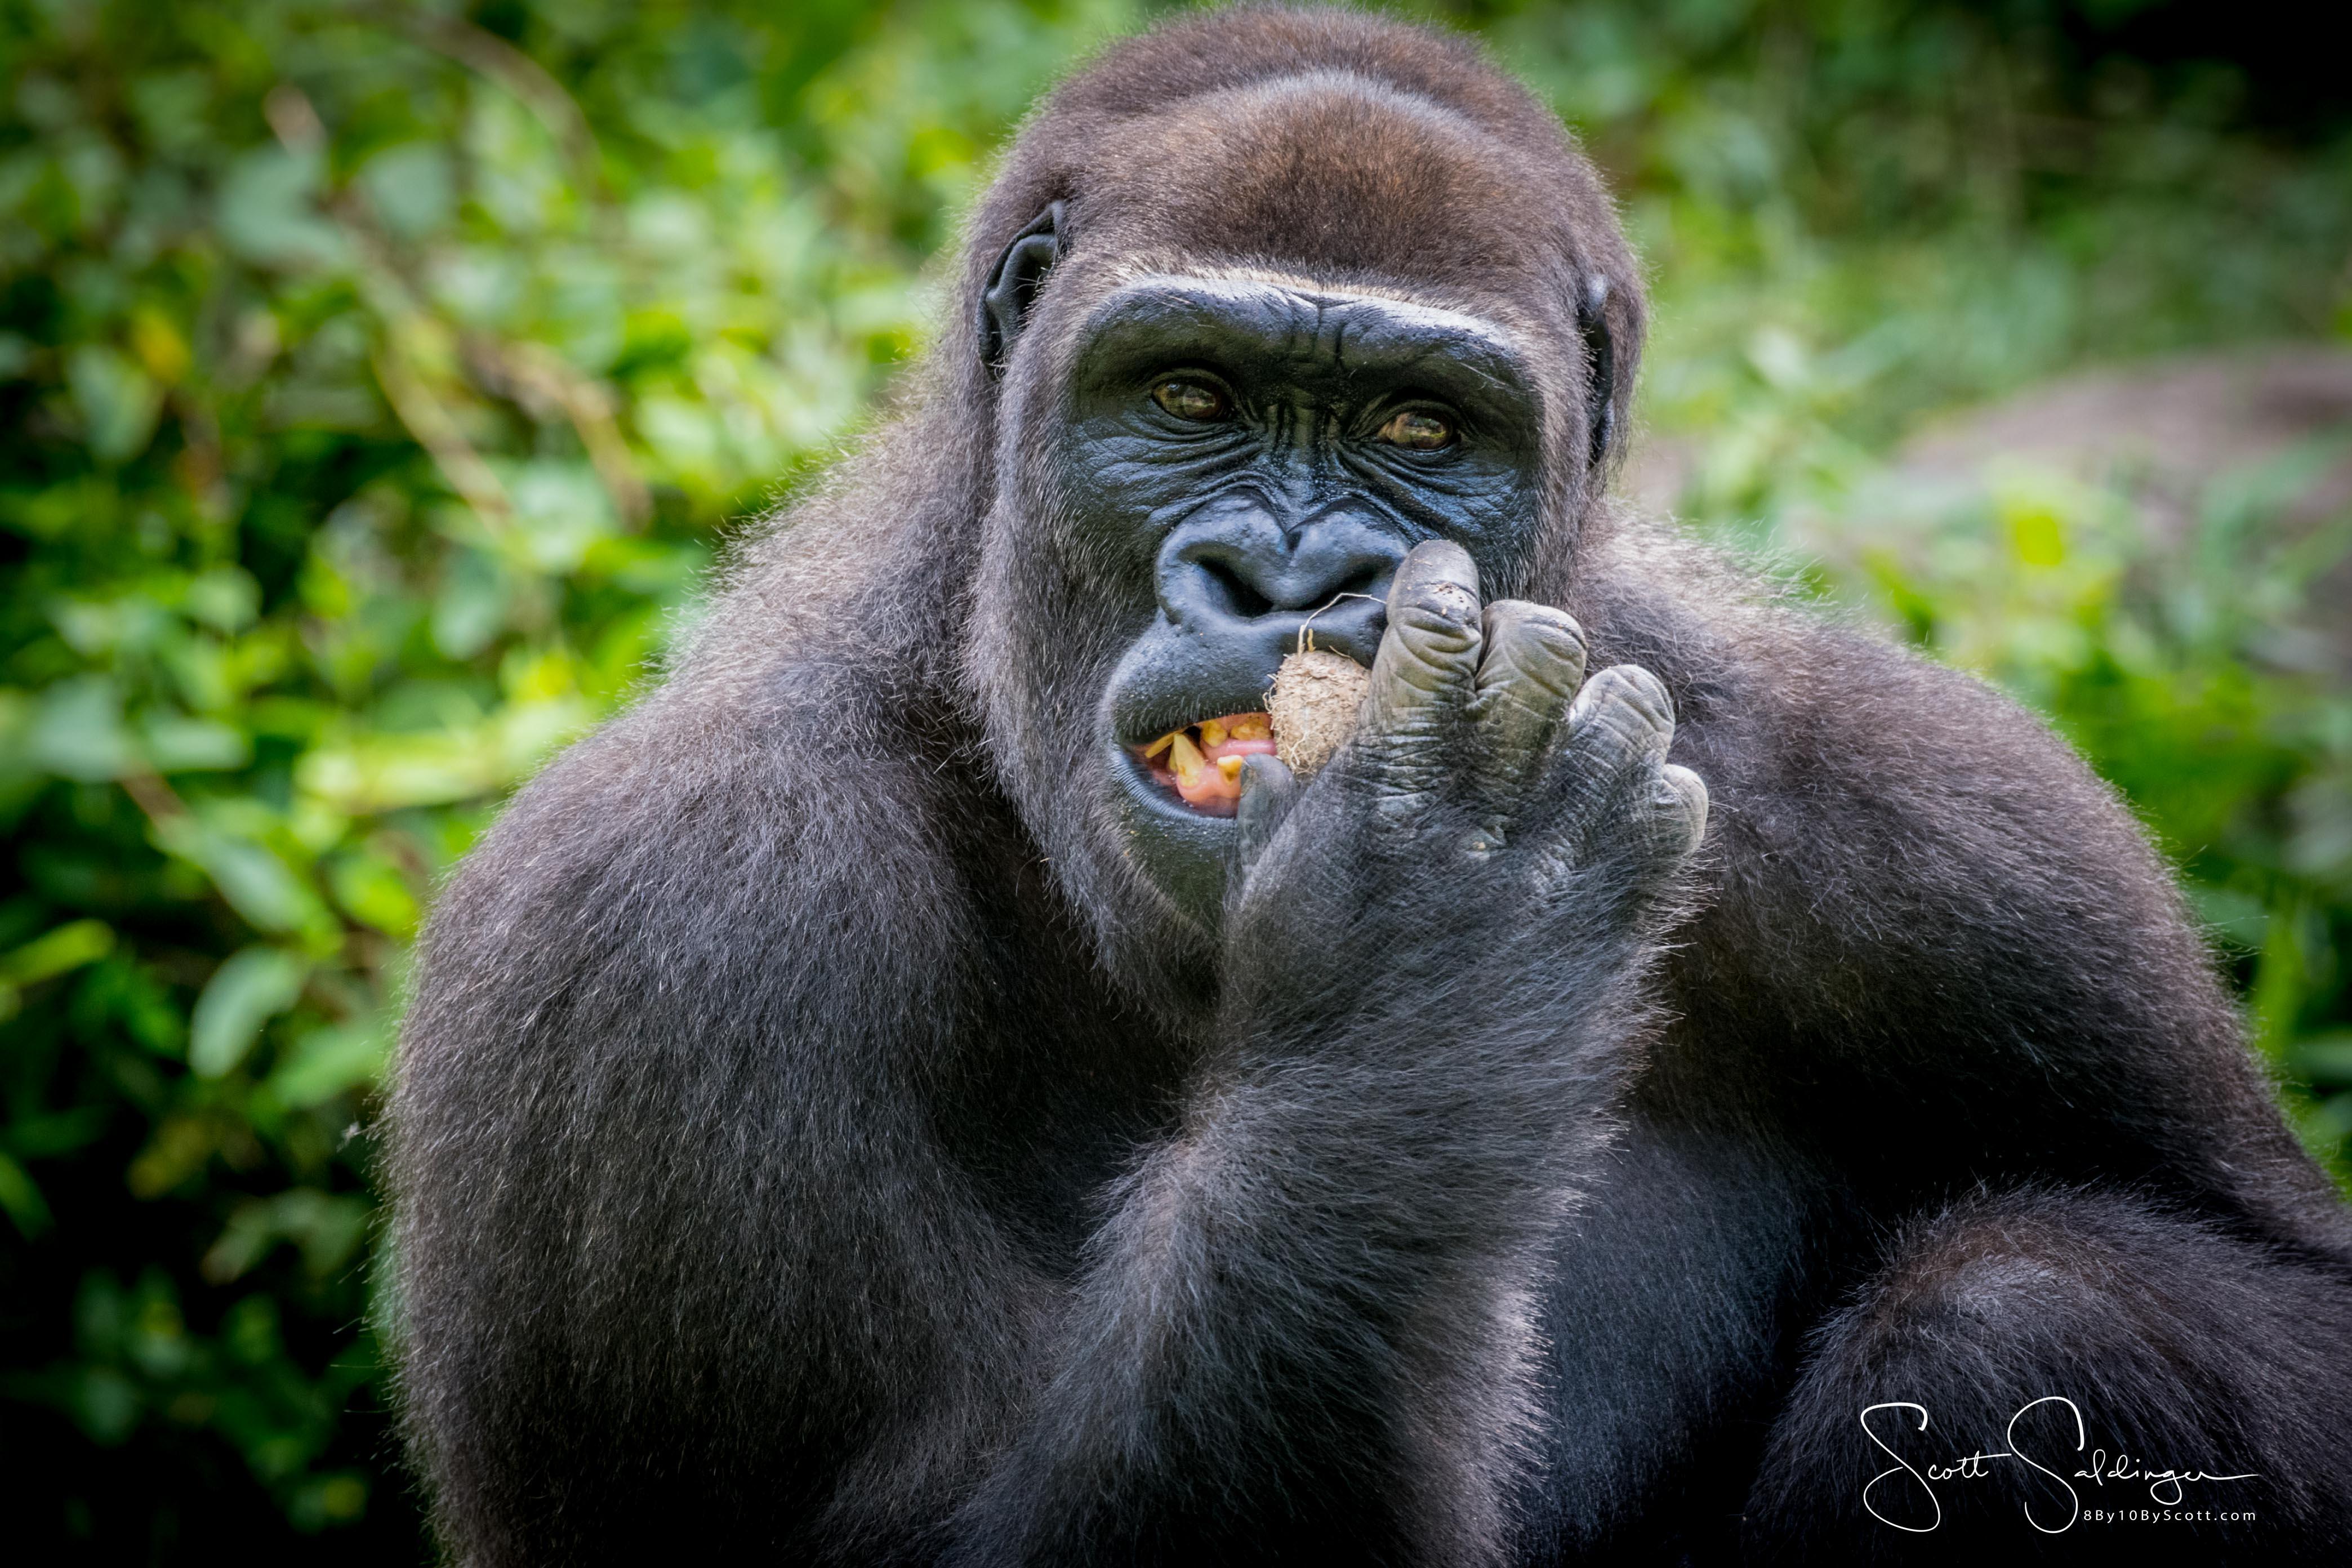 Apes-5543